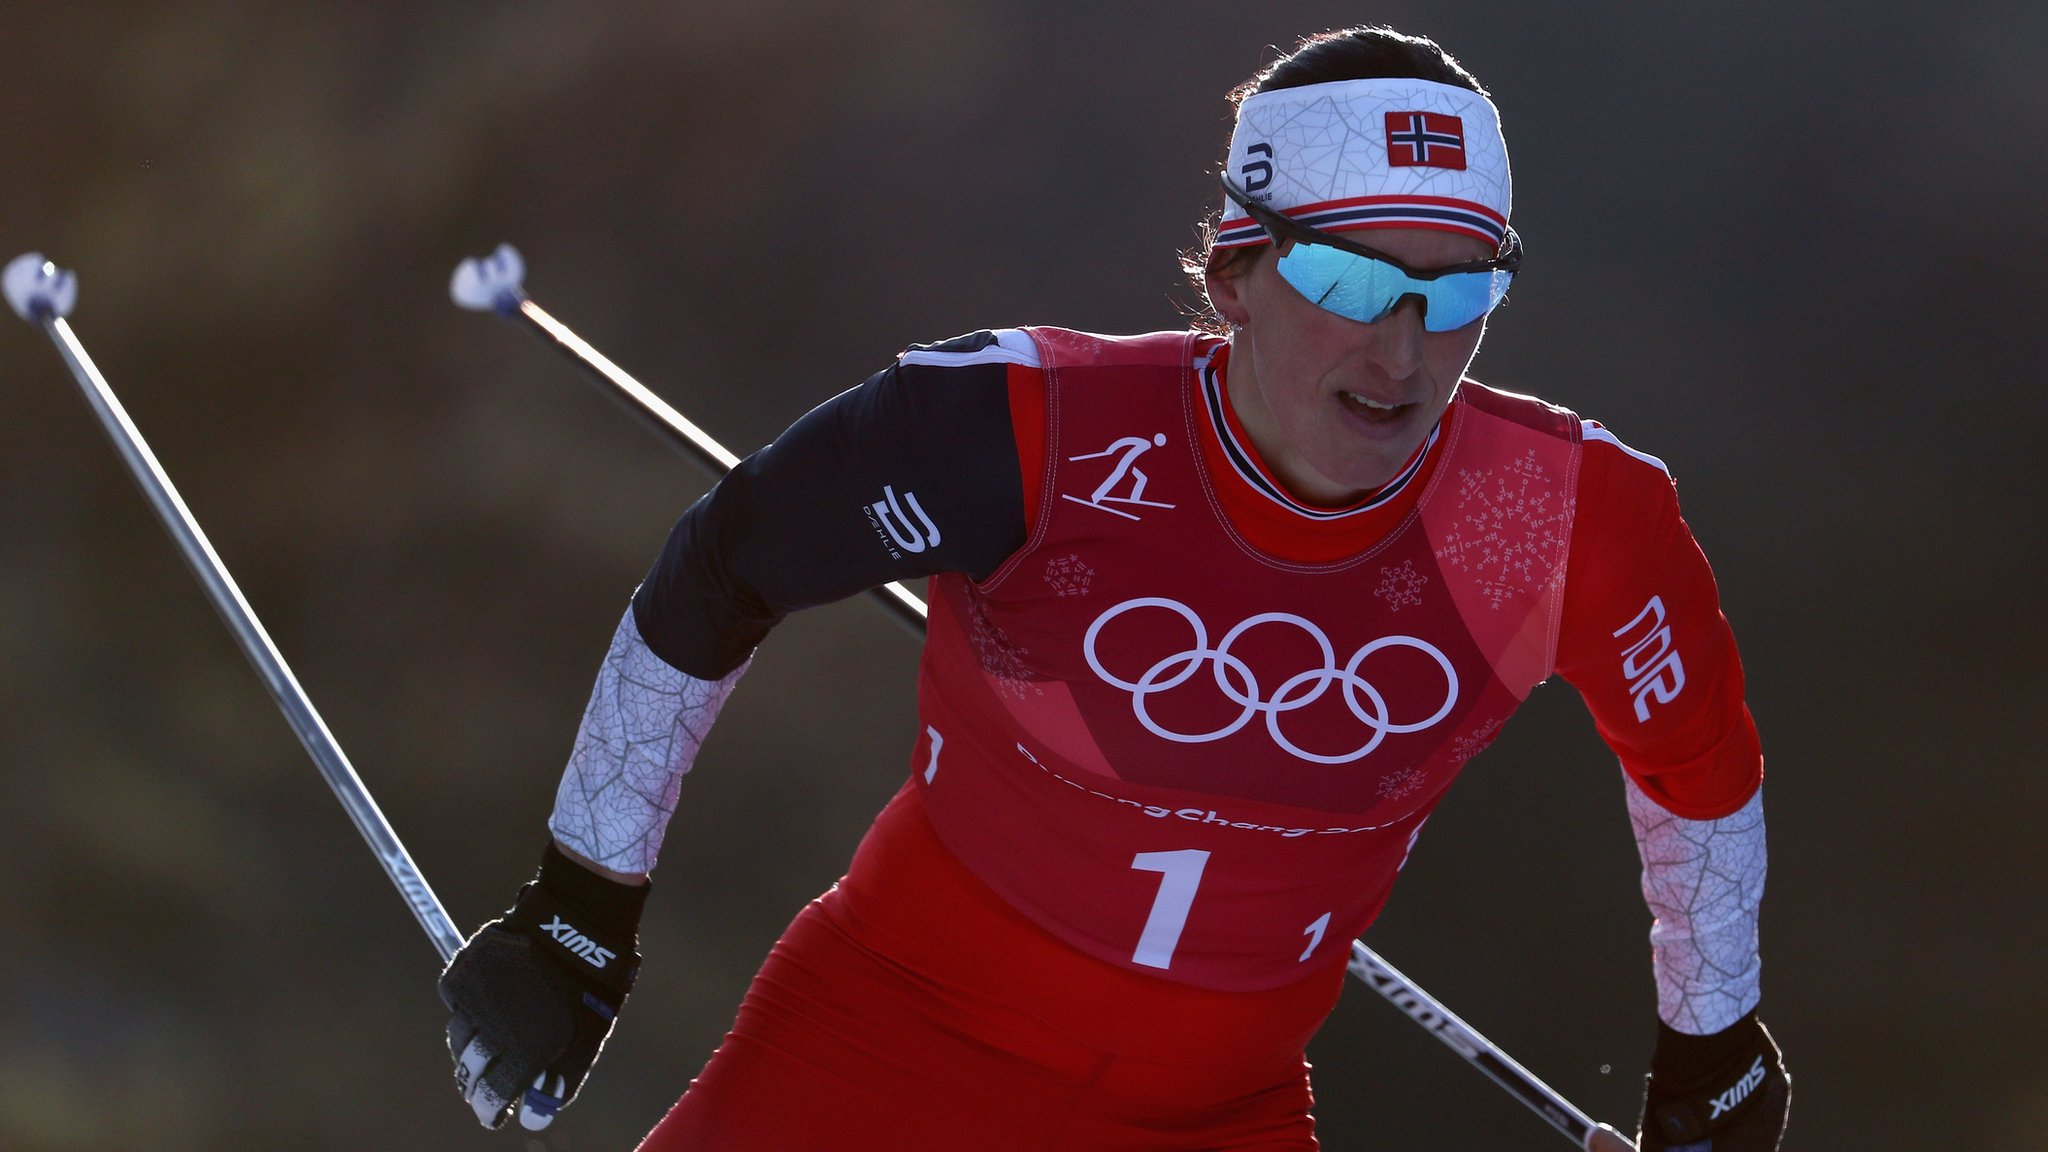 Winter Olympics Norways Marit Bjorgen creates history as USA win team gold